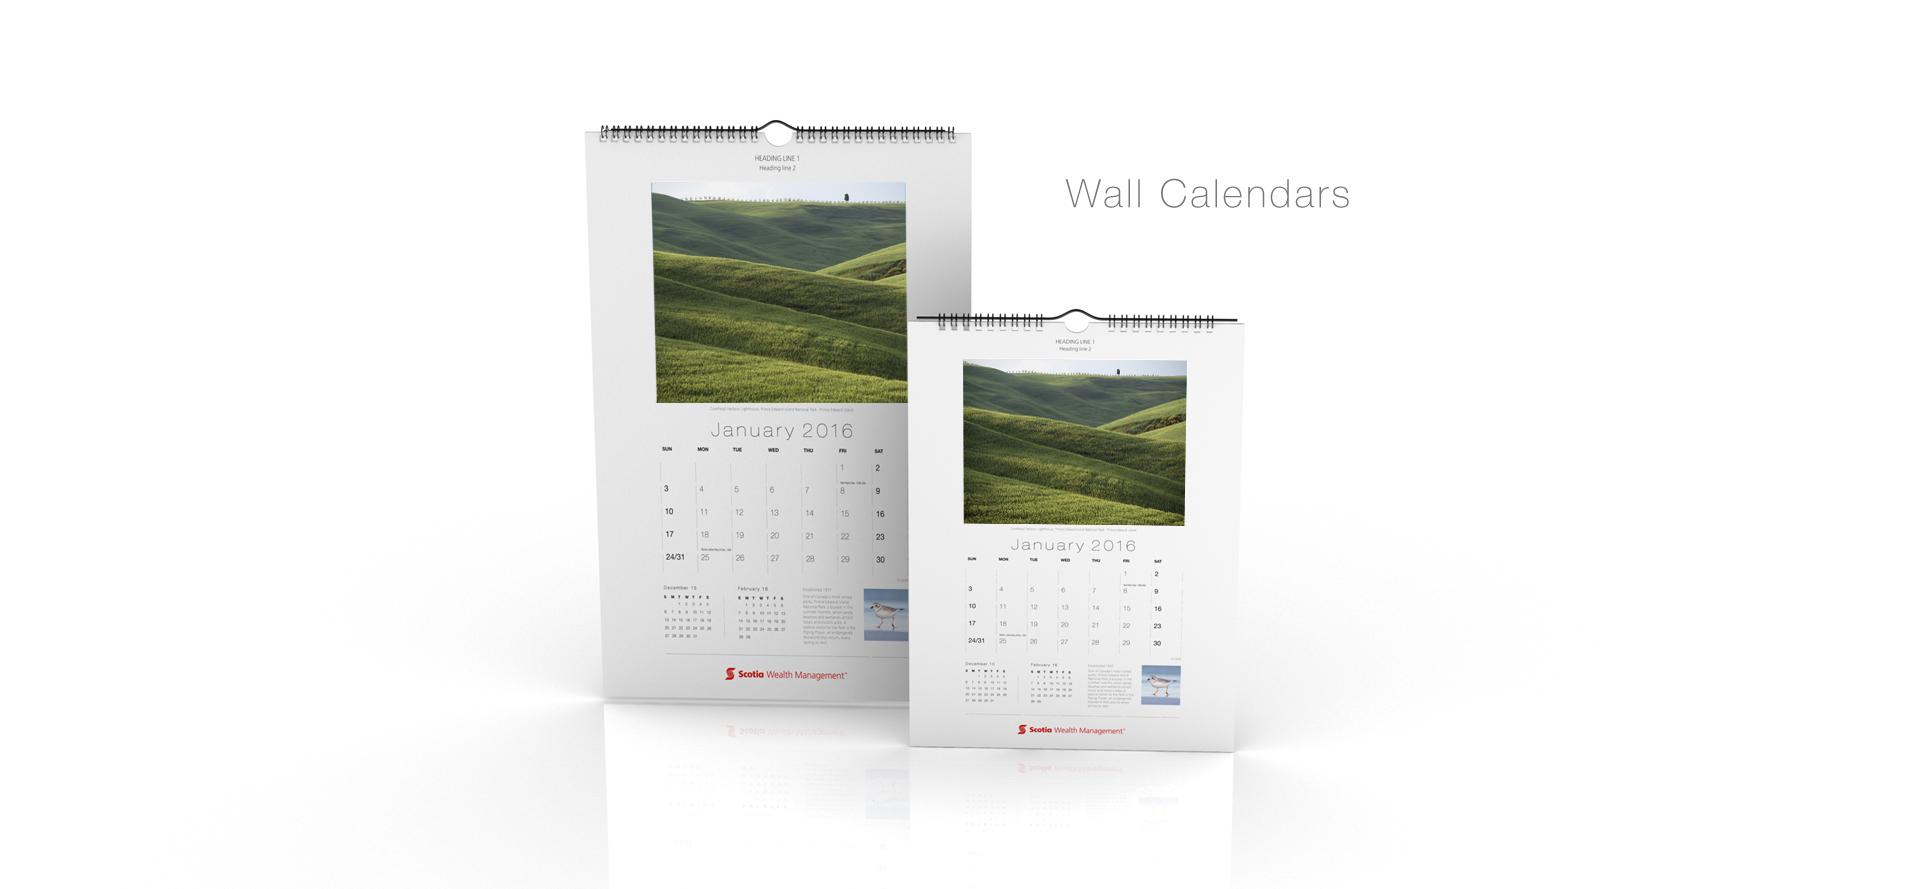 Imagine-Wall-Calendar-images-2a